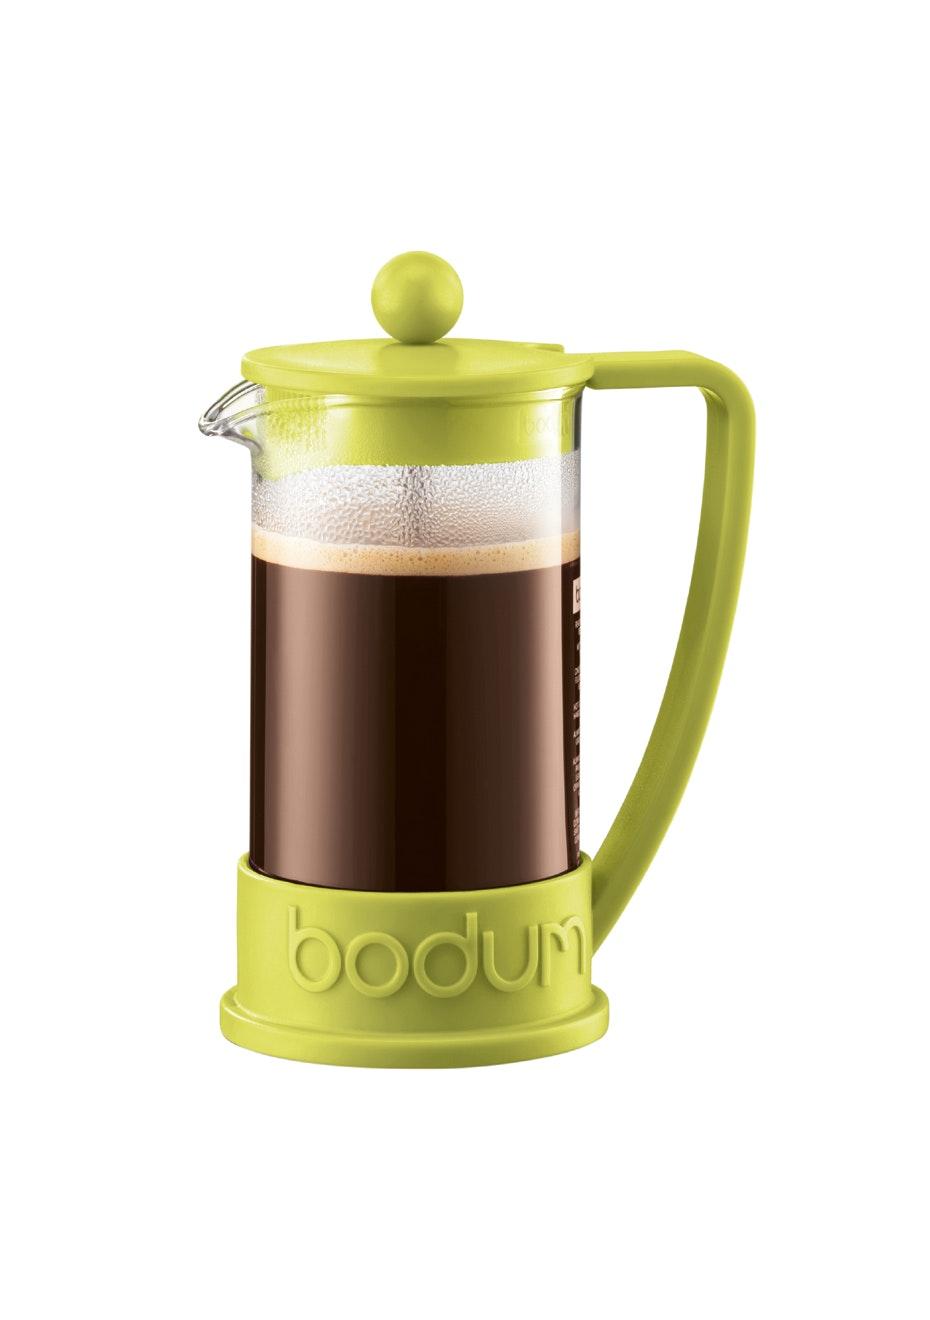 Bodum - French Press Coffee Maker, 3 Cup, 0.35L